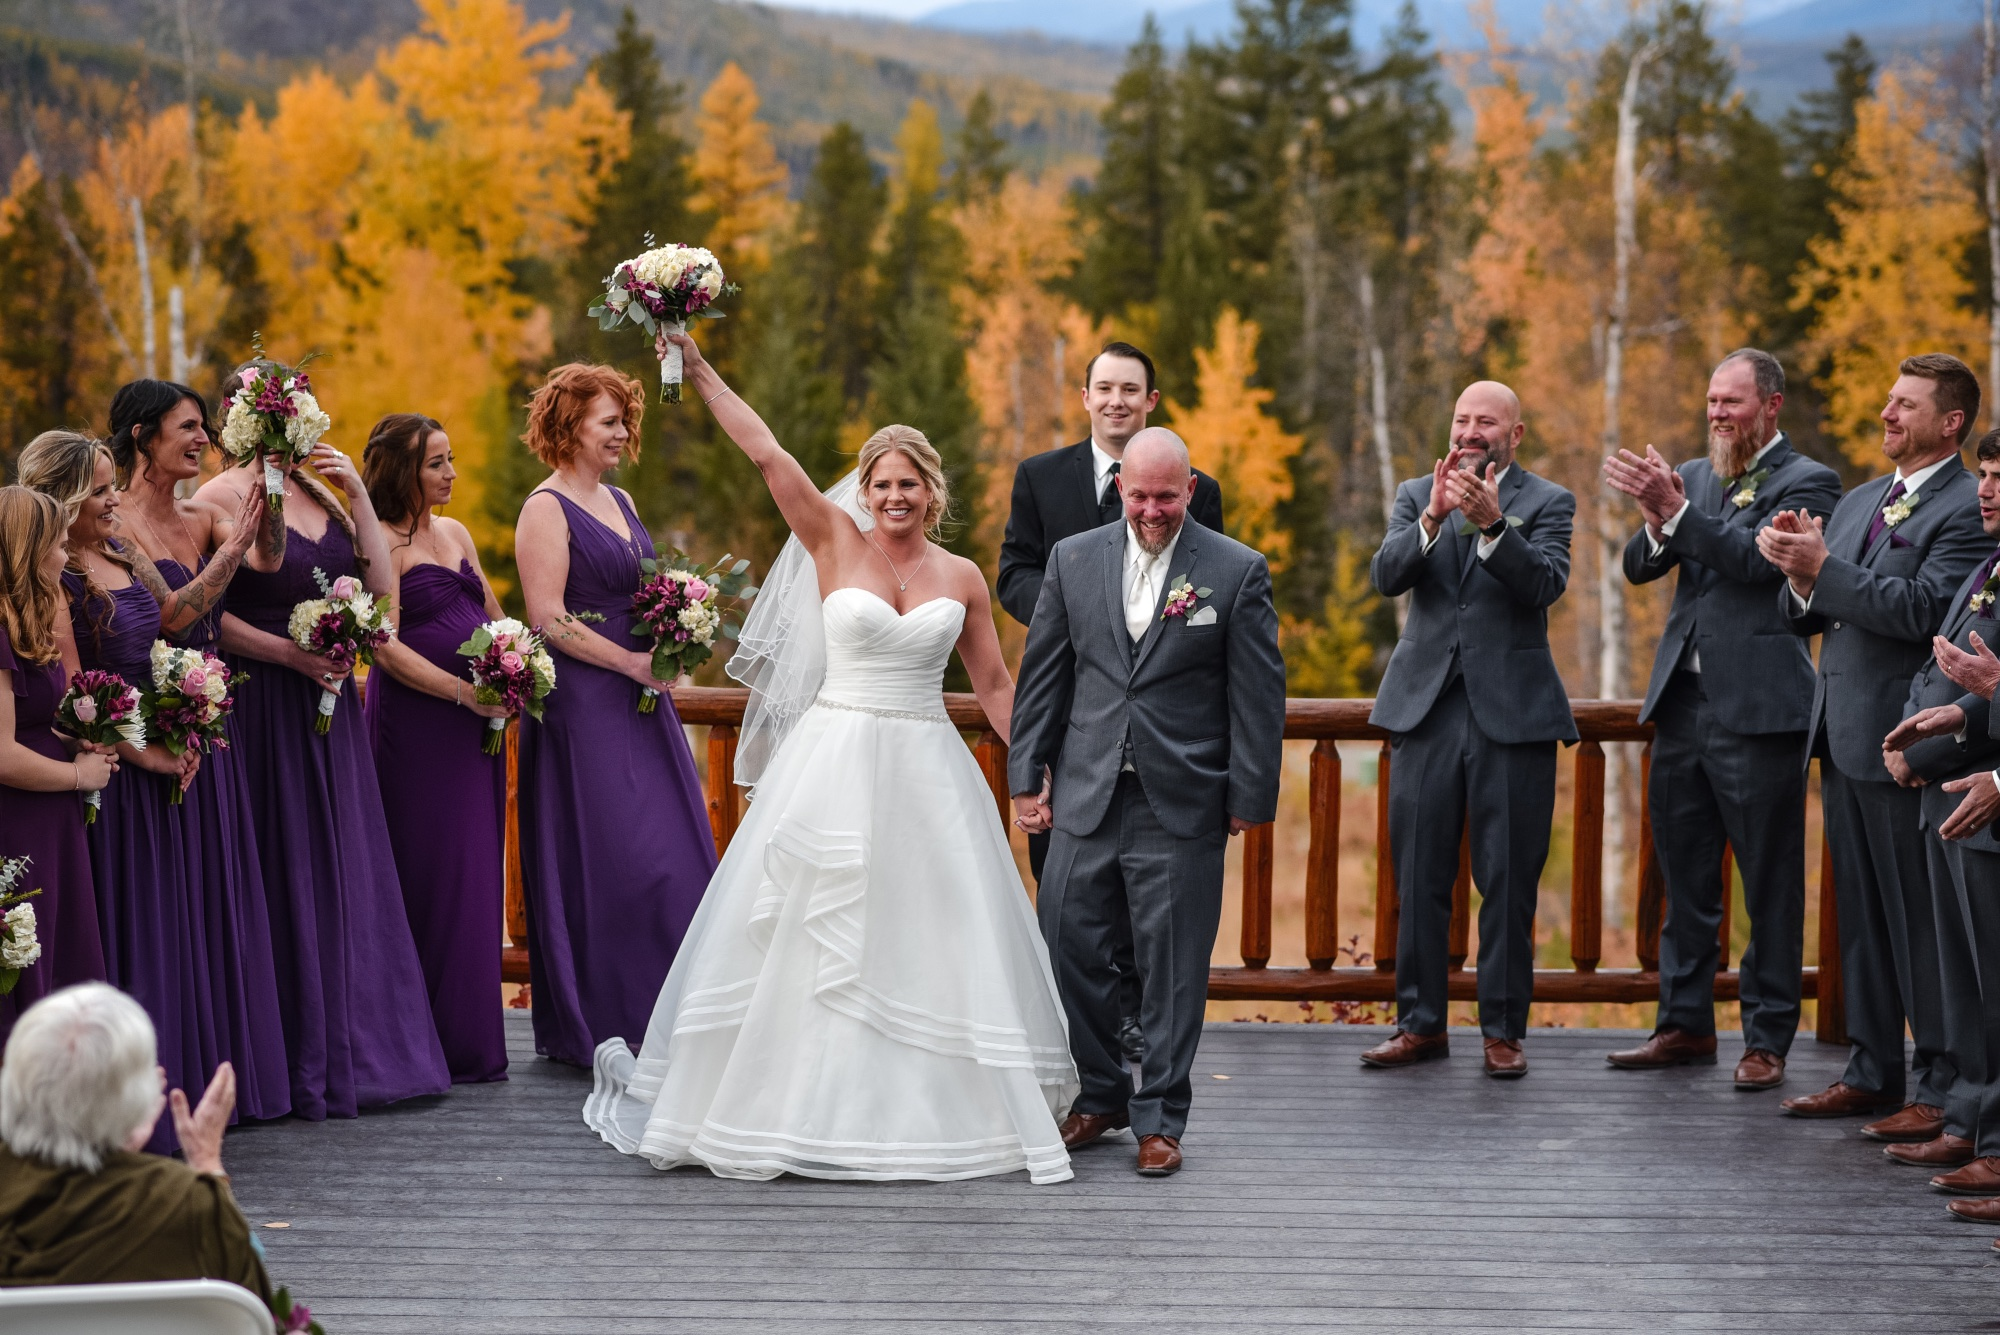 lindseyjane_wedding070.jpg